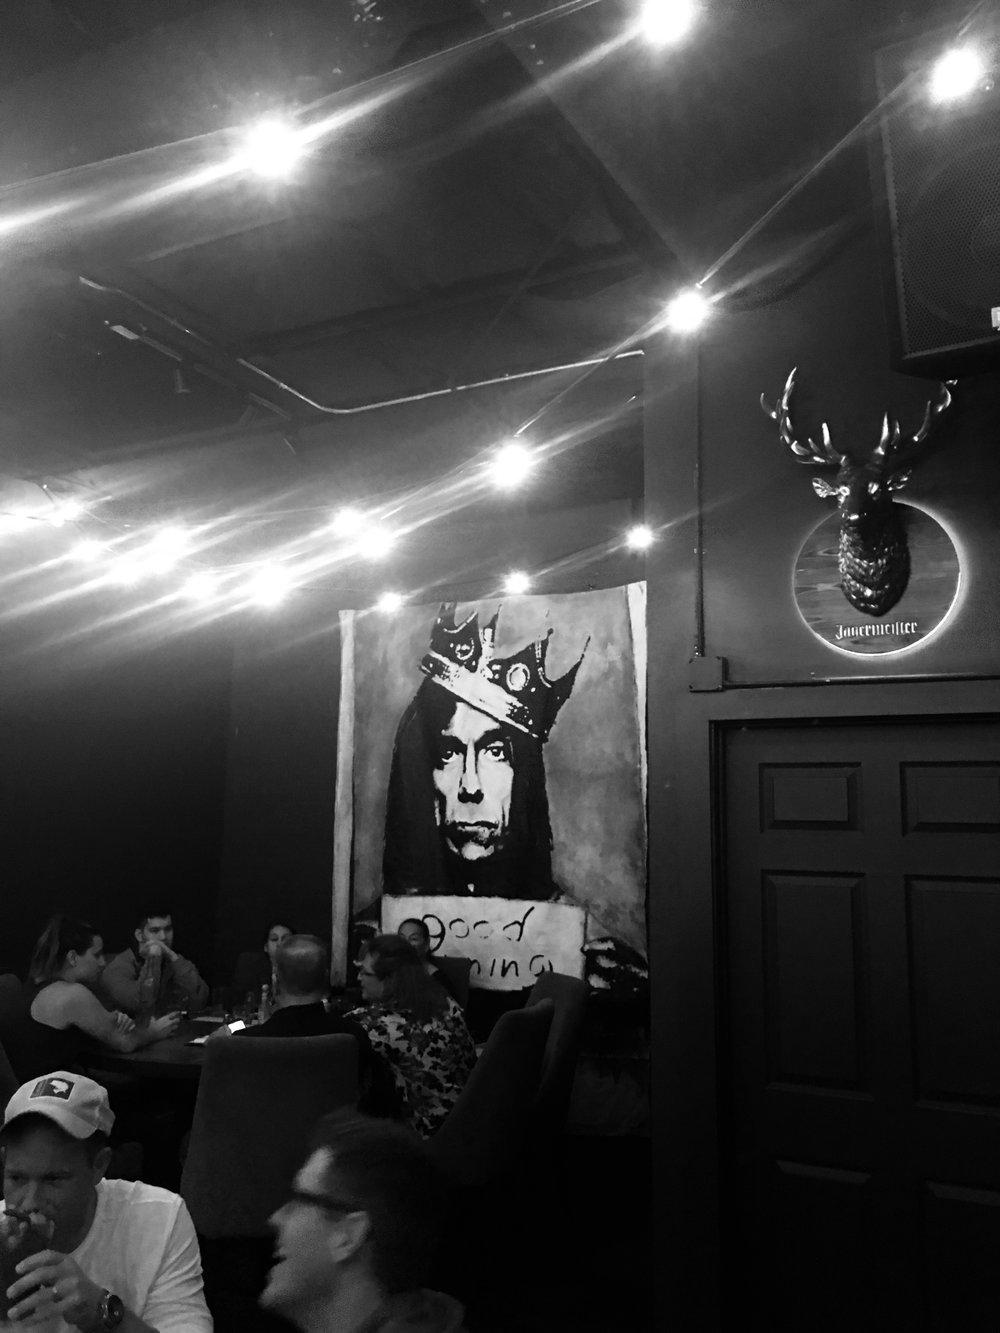 Austin_photo by Mandy Zelinka_2018_21.jpg